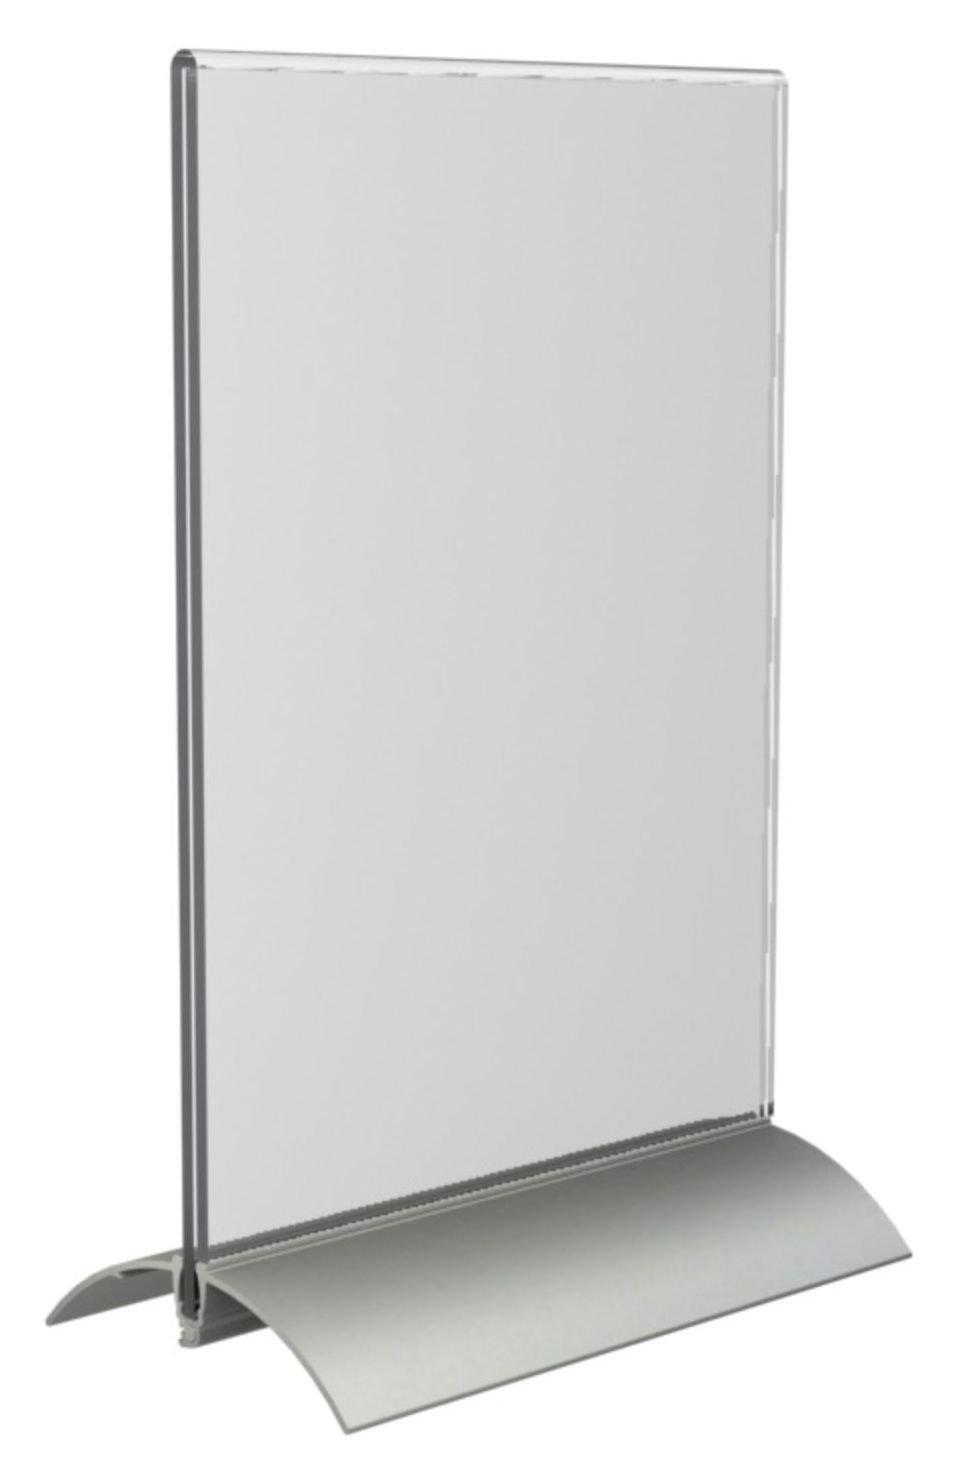 OPUS 2 Pr/ésentoir de table 350061 A5 acrylique transparent Vertical Profil/é Aluminium